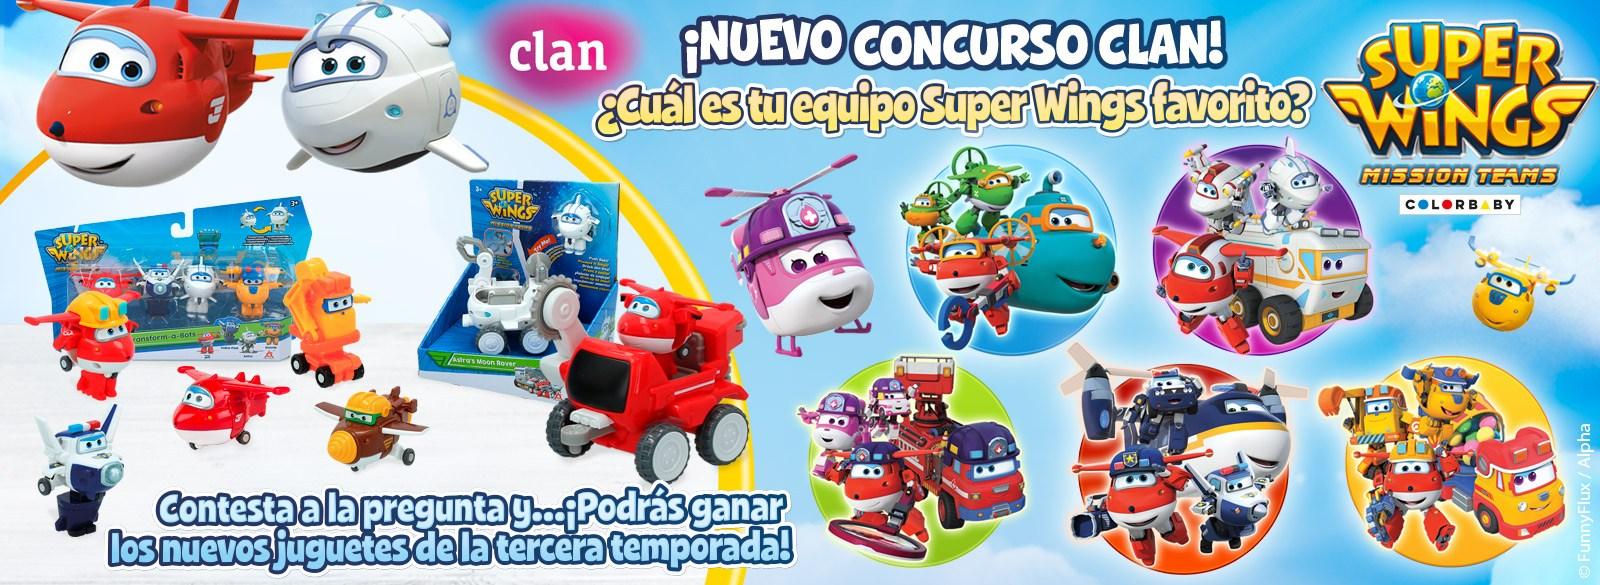 Concurso Superwings